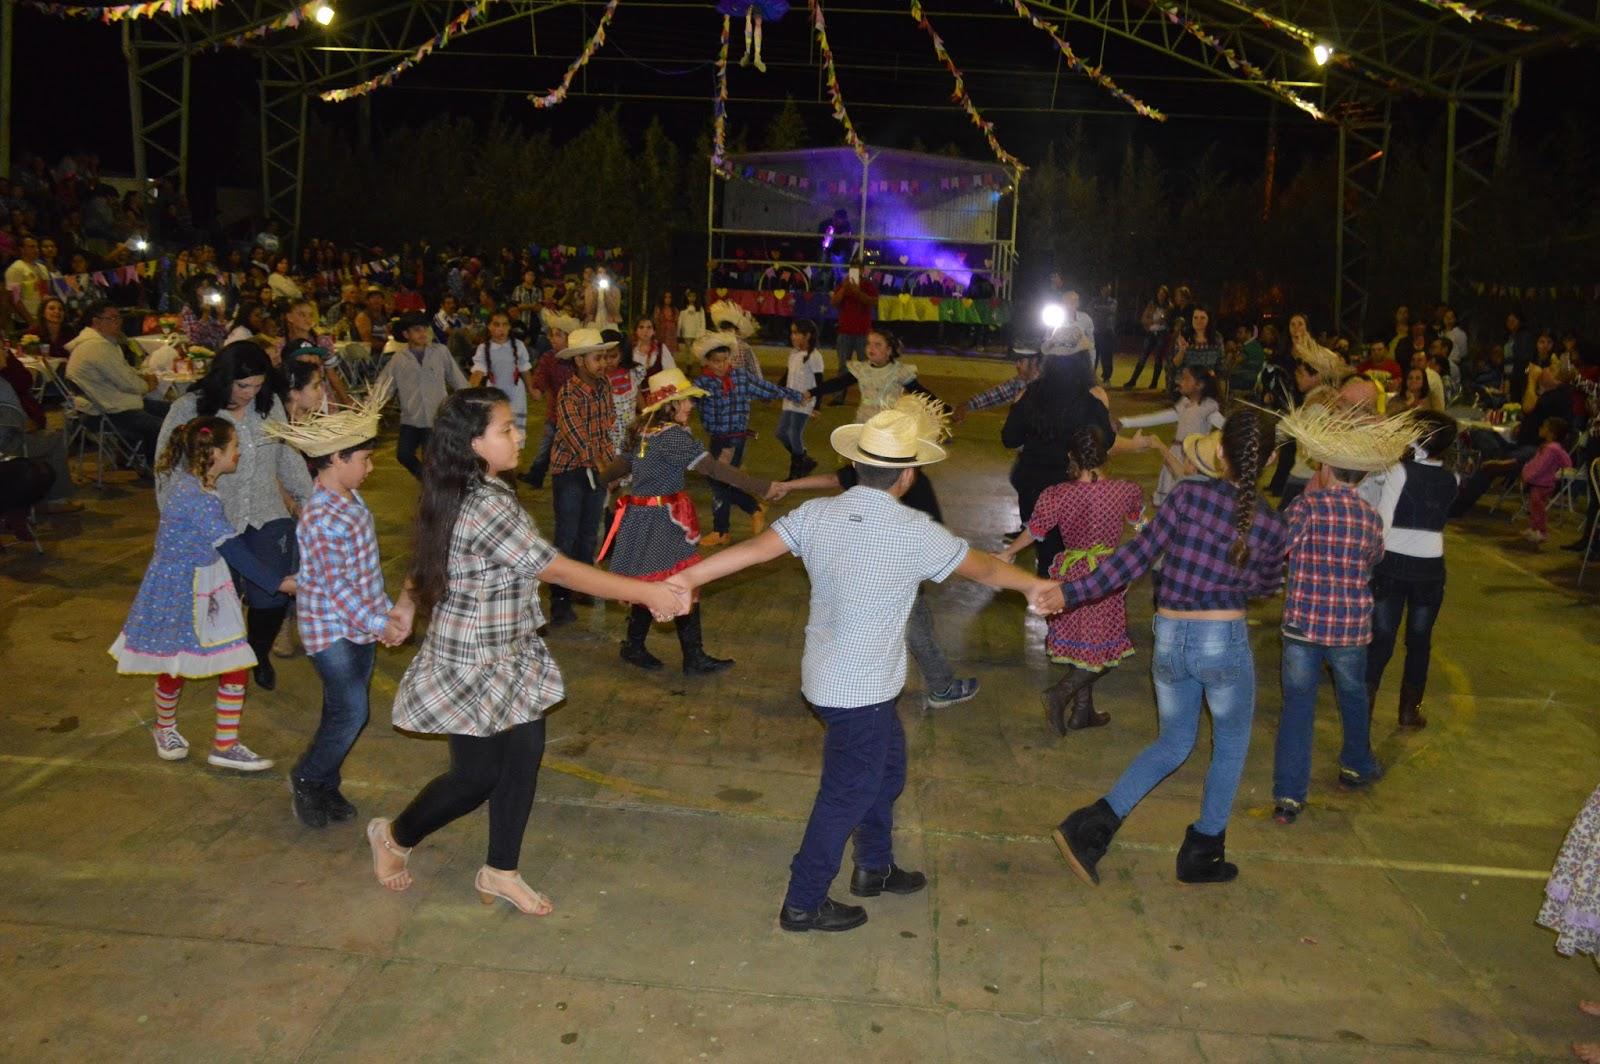 Circuito Festa Junina Uberlandia : Guarapiranga abre circuito de festas juninas no município